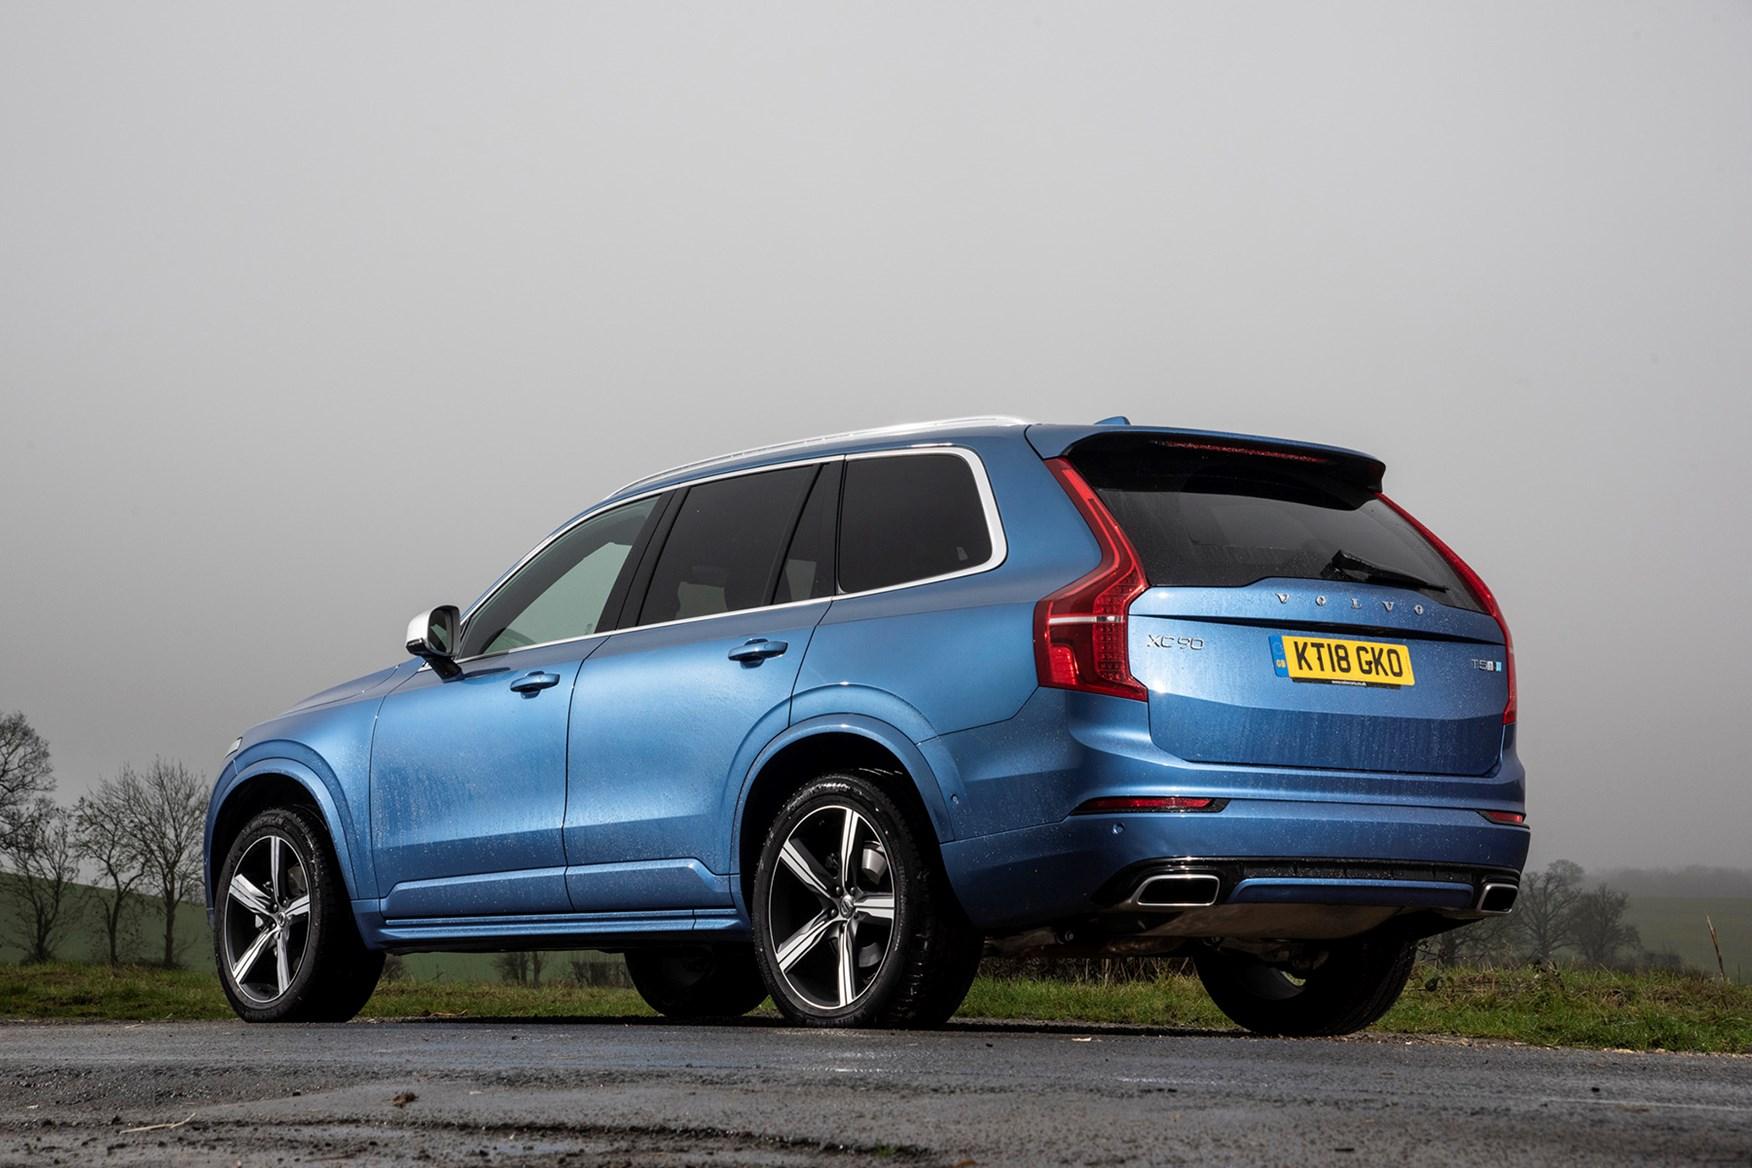 Volvo XC90 rear